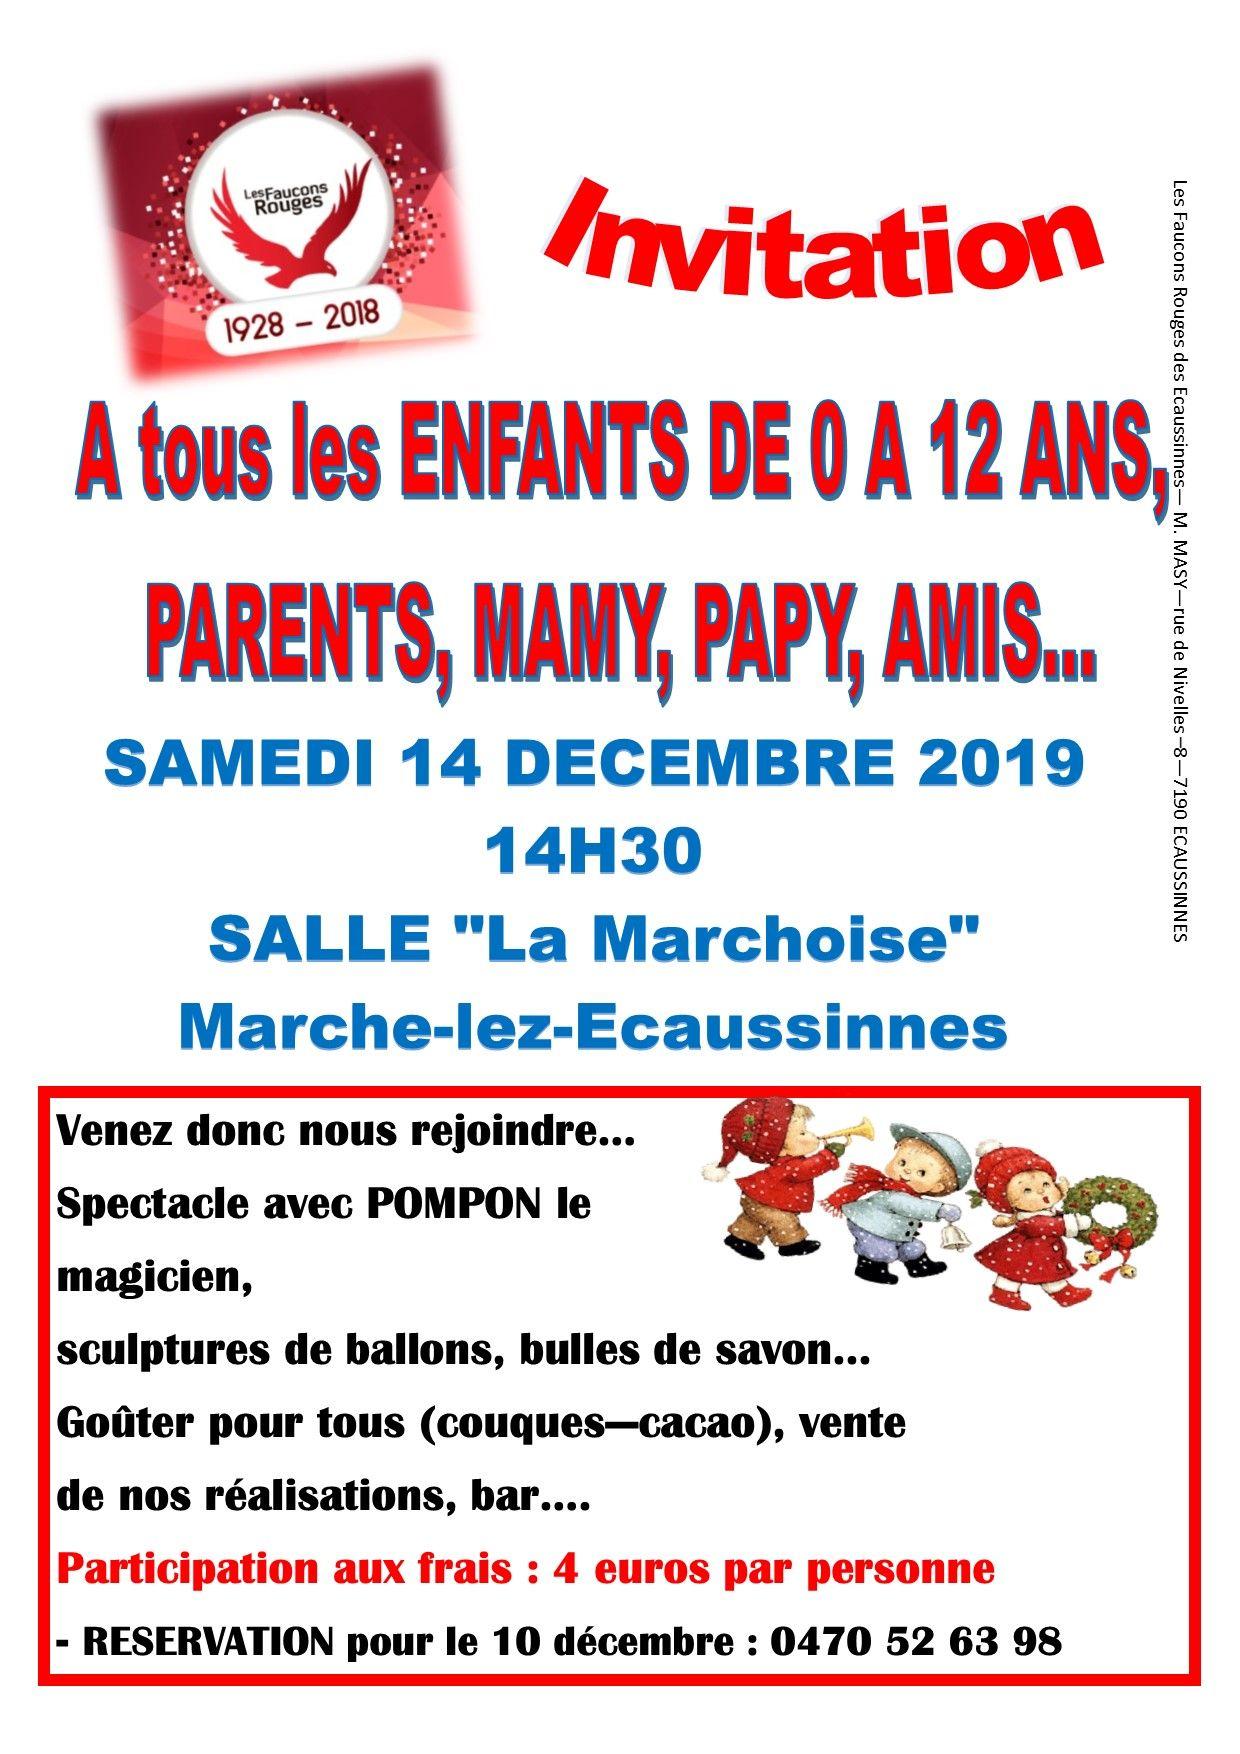 Écaussinnes – Spectacle, sculptures de ballons…